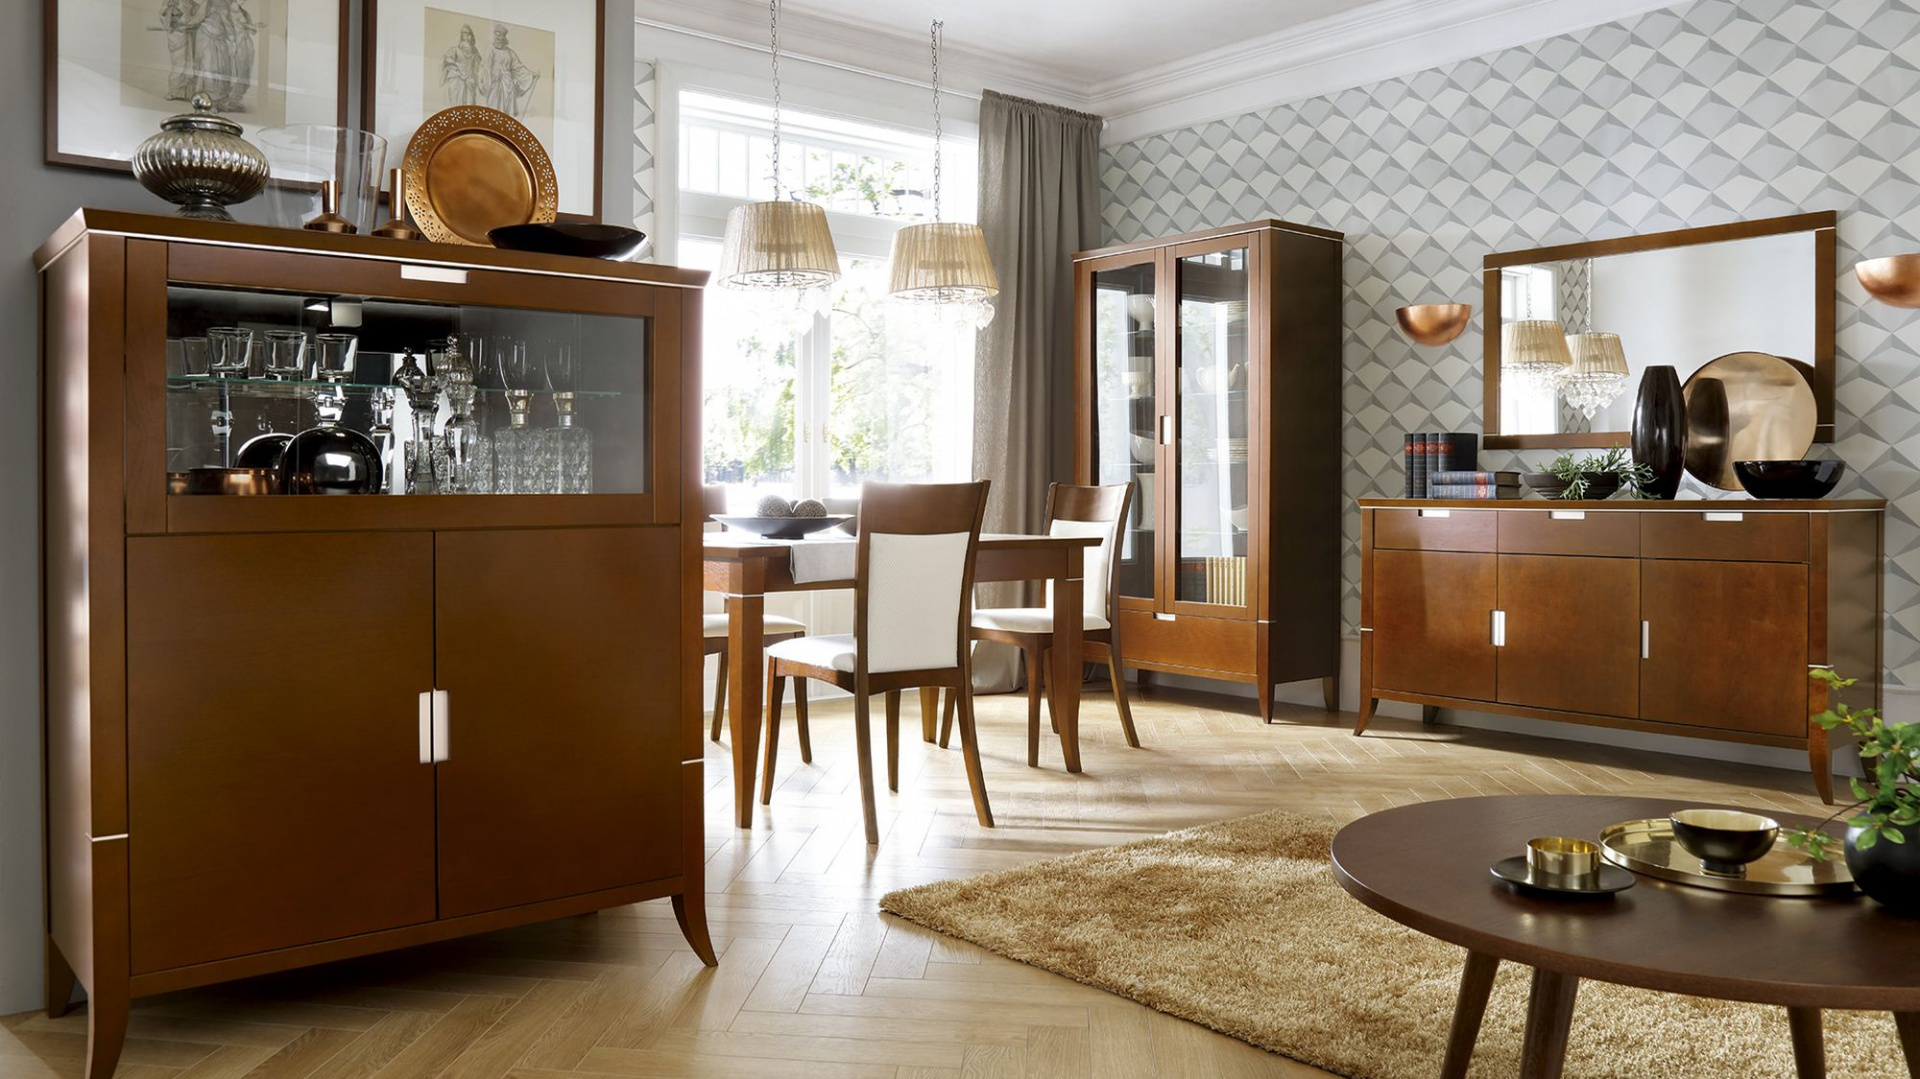 kolekcja mebli do salonu i jakie meble do jadalni